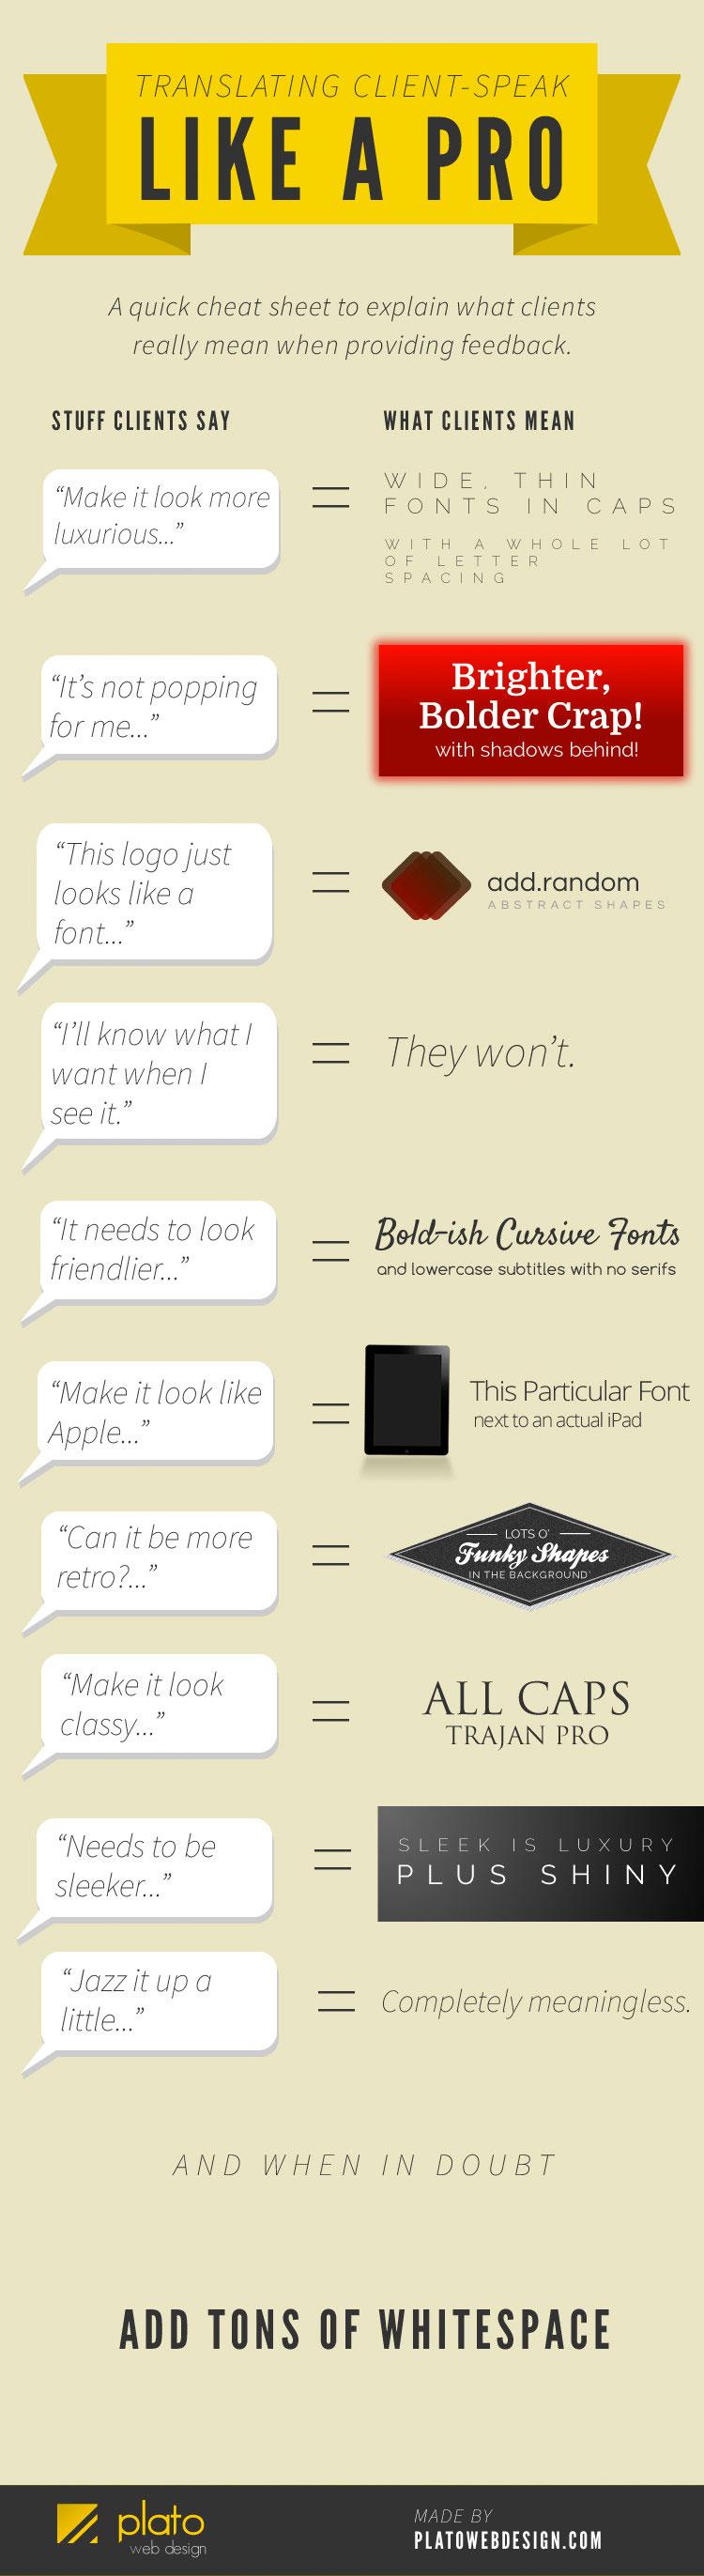 A Designer's Client Feedback Cheat Sheet